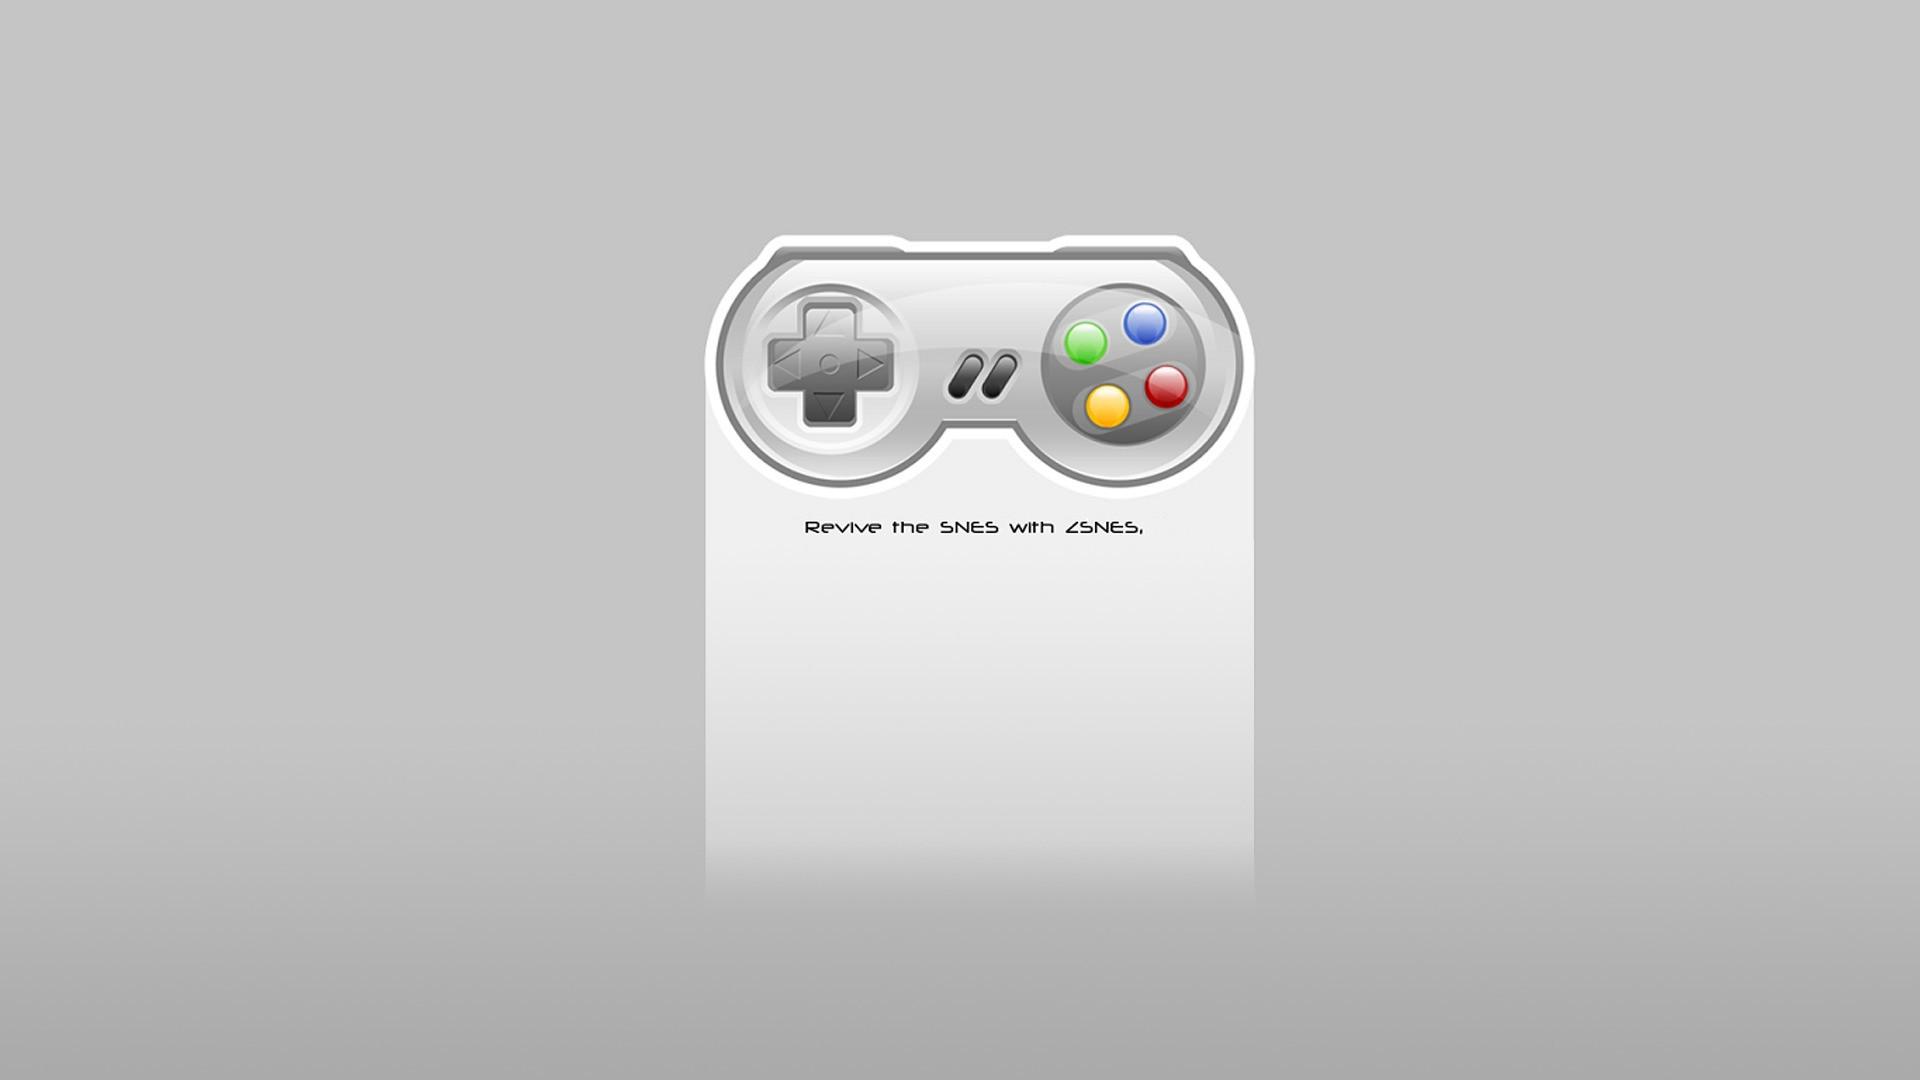 Res: 1920x1080, Similar Wallpapers. Super Nintendo, Emulator, Retro Games